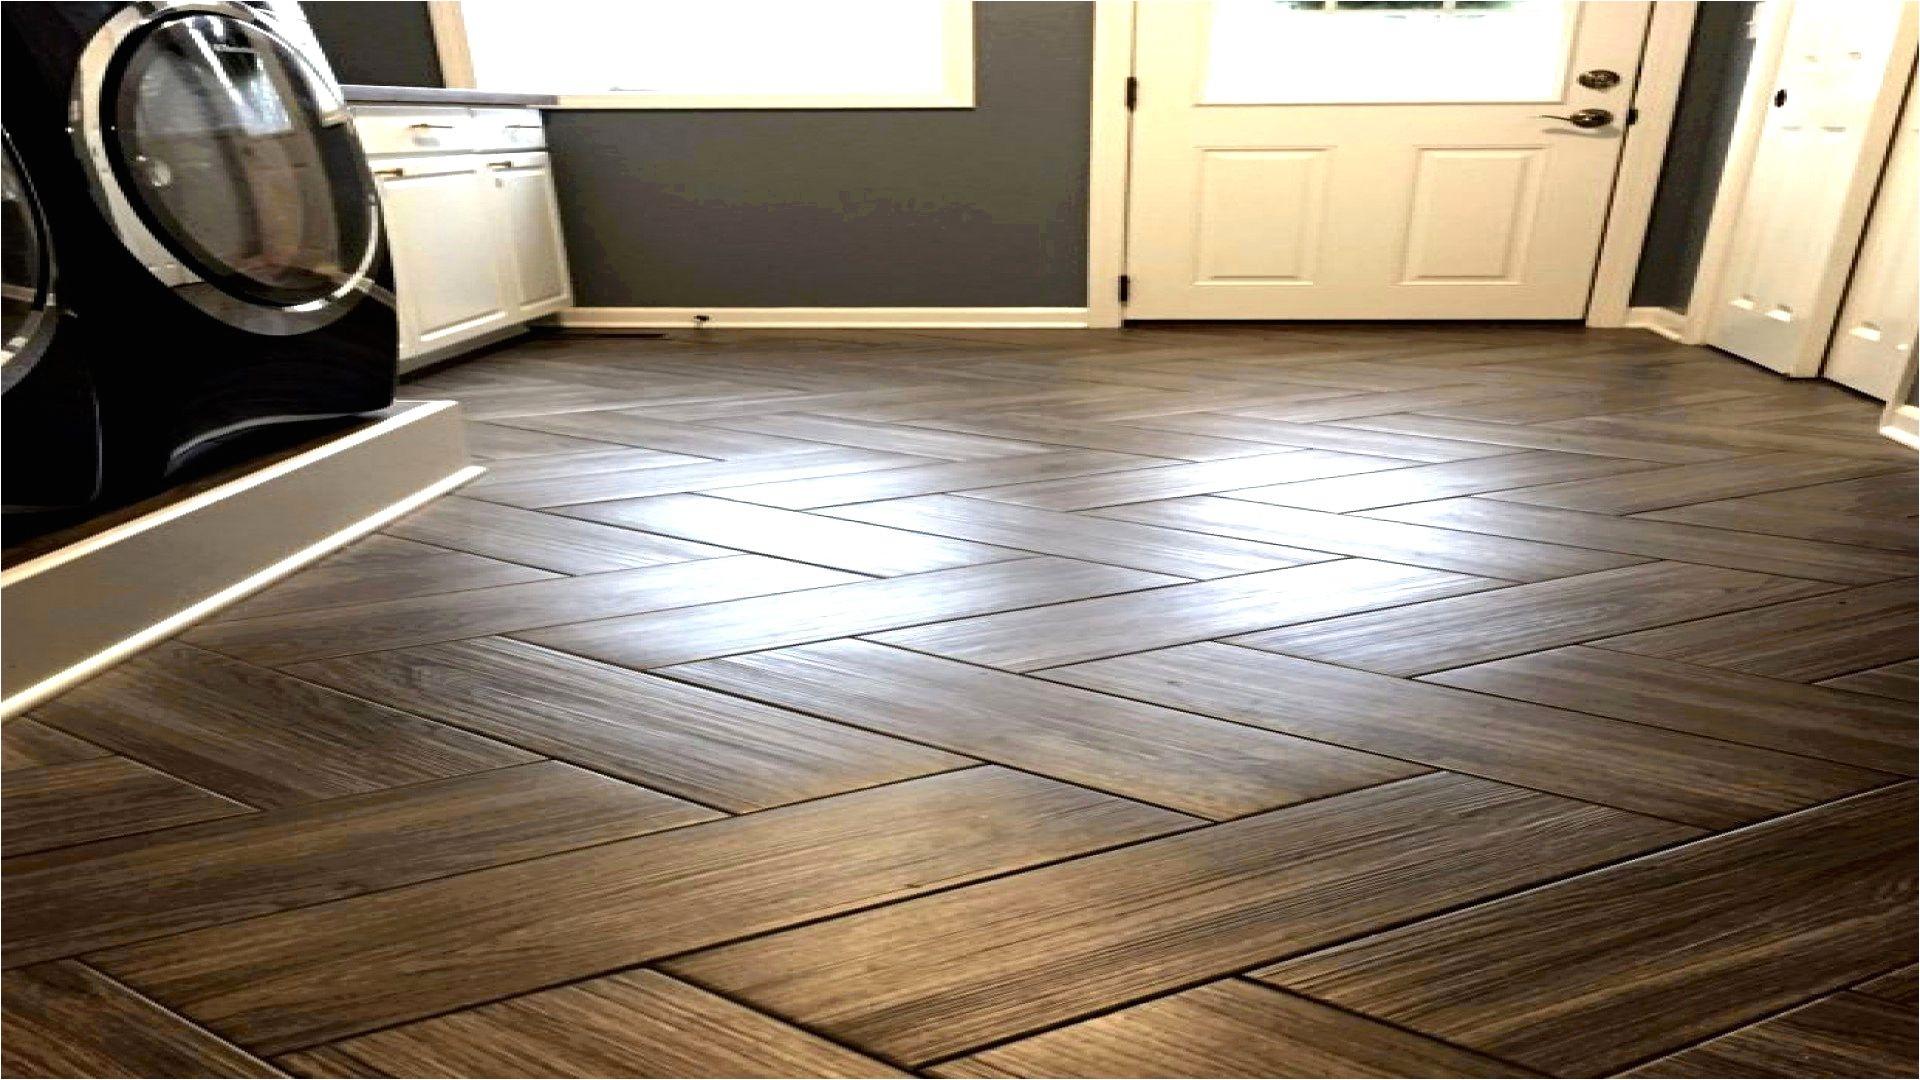 Wide Plank Hardwood Flooring for Sale Of Gluing Vinyl Plank Flooring On Walls Bradshomefurnishings Regarding 40 How to Remove Vinyl Floor Tile Inspiration